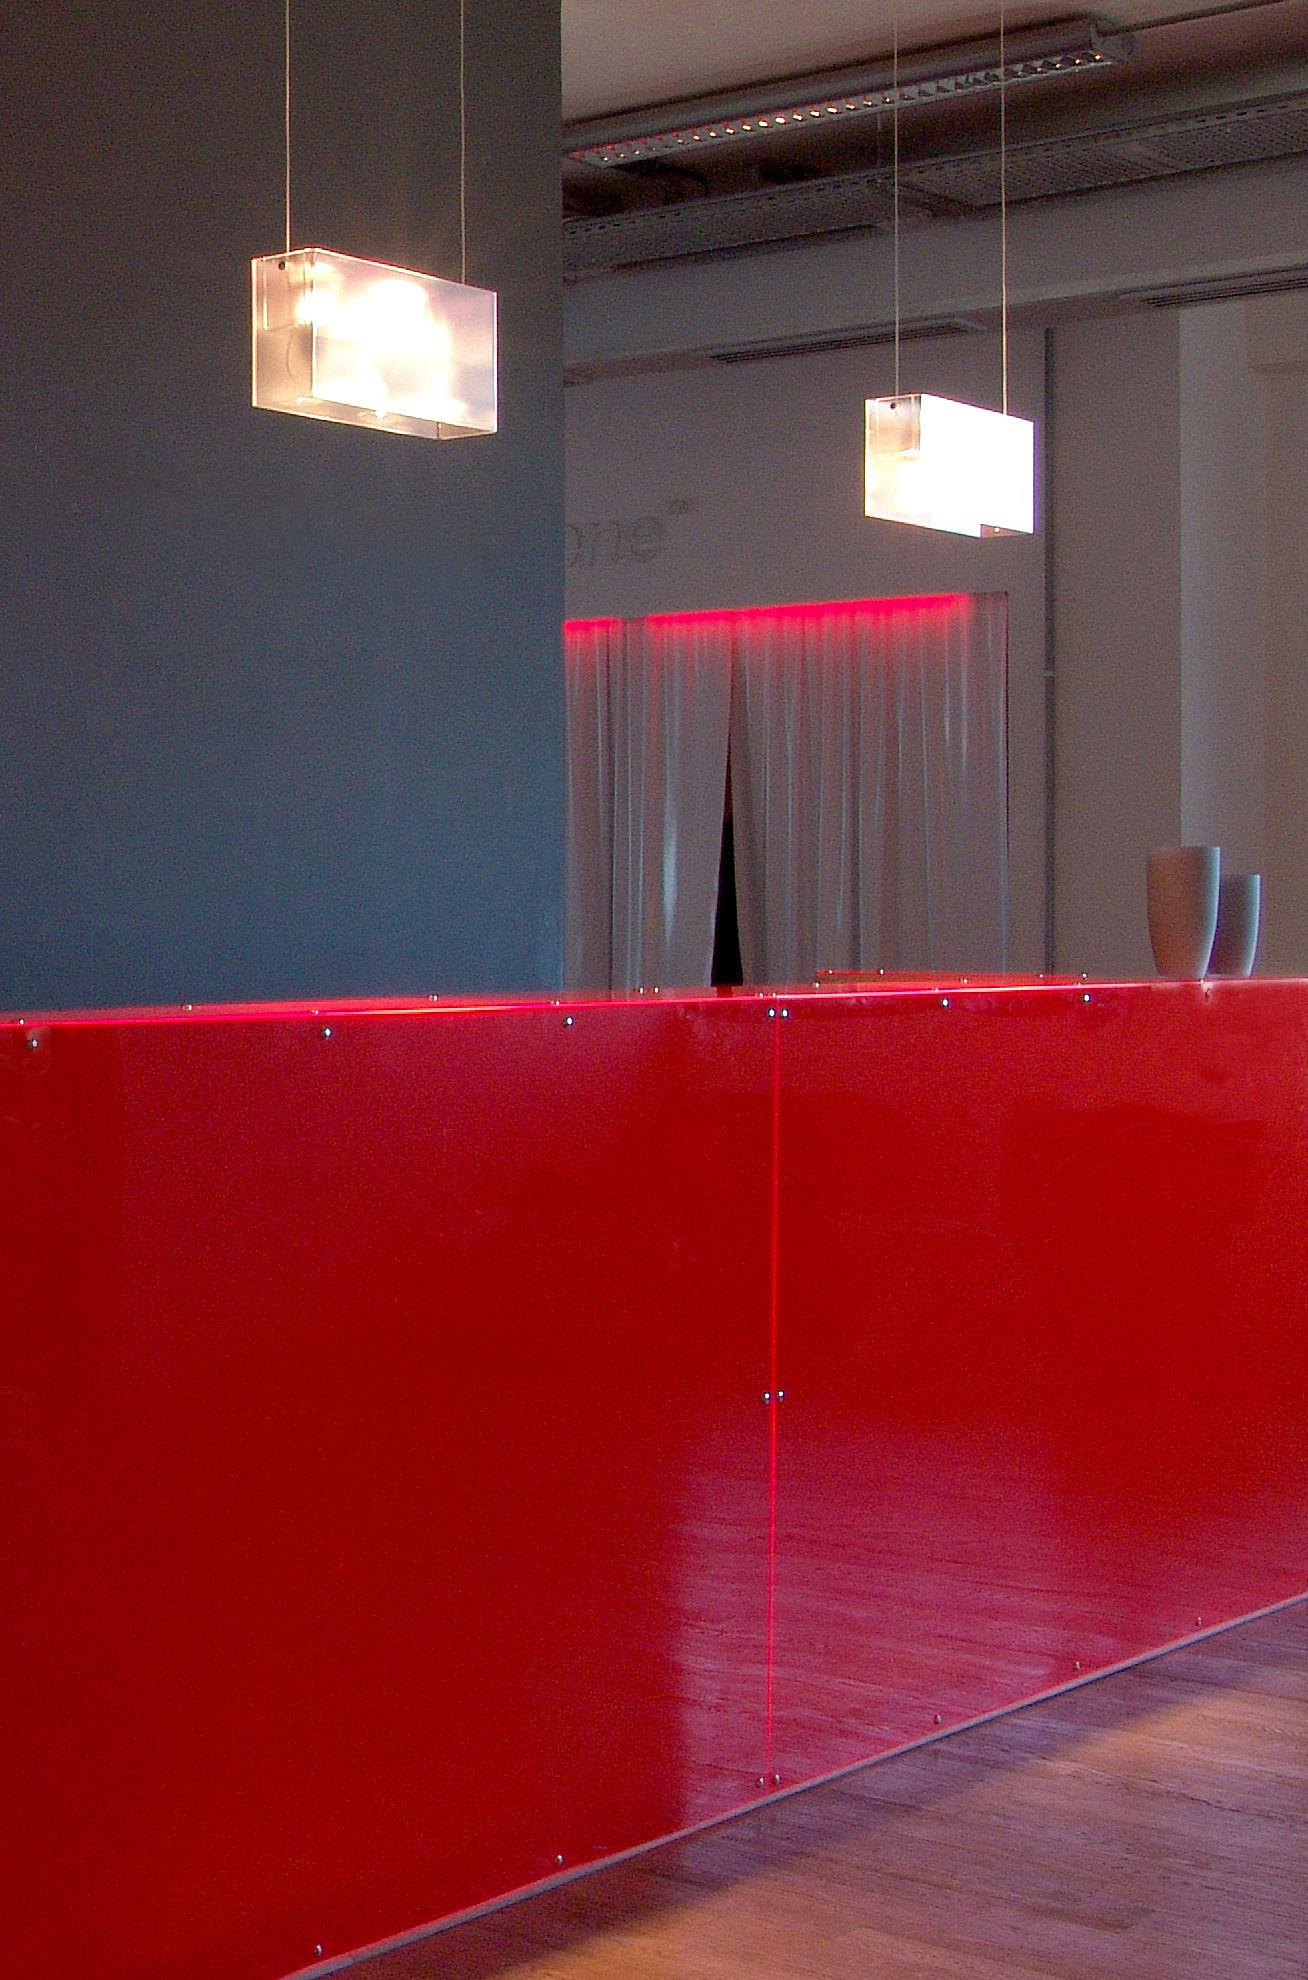 duplex pendant satined by fontana arte. Black Bedroom Furniture Sets. Home Design Ideas